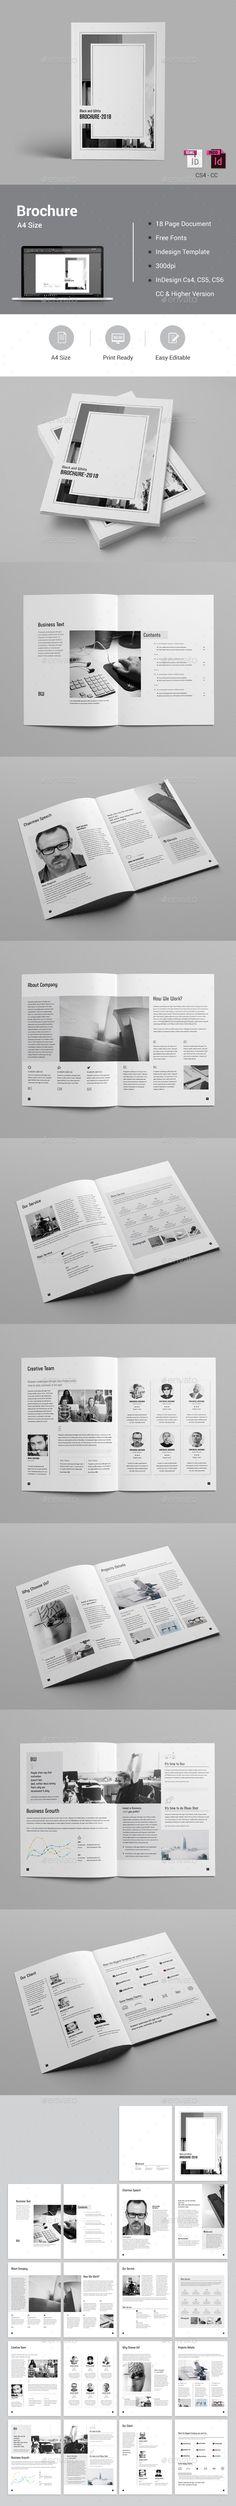 Black & White Brochure Template InDesign INDD